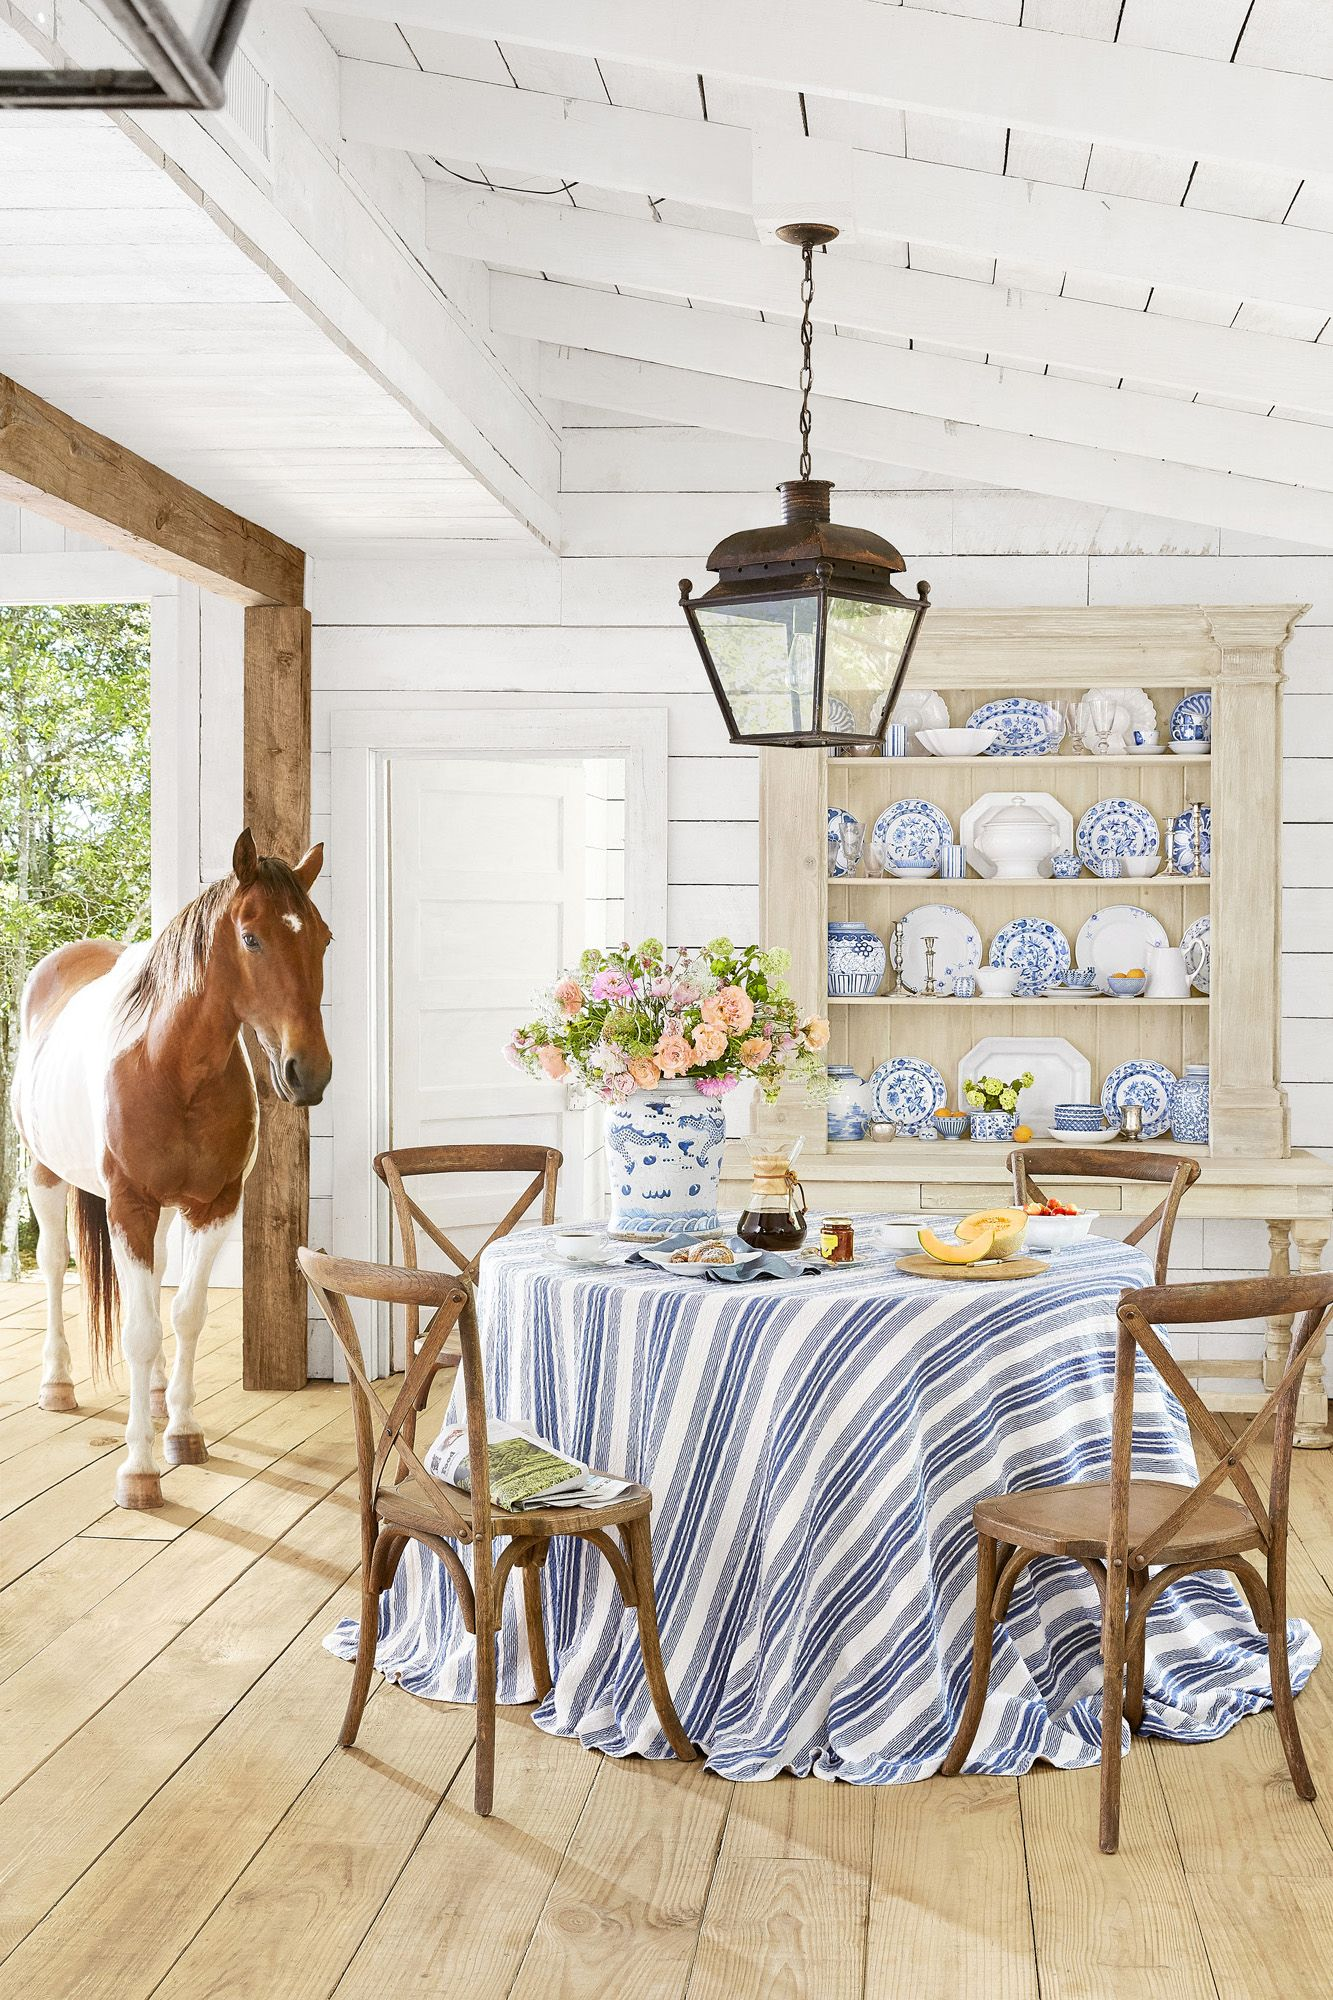 Fullsize Of Buffalo Ranch Rustic Home Furnishings